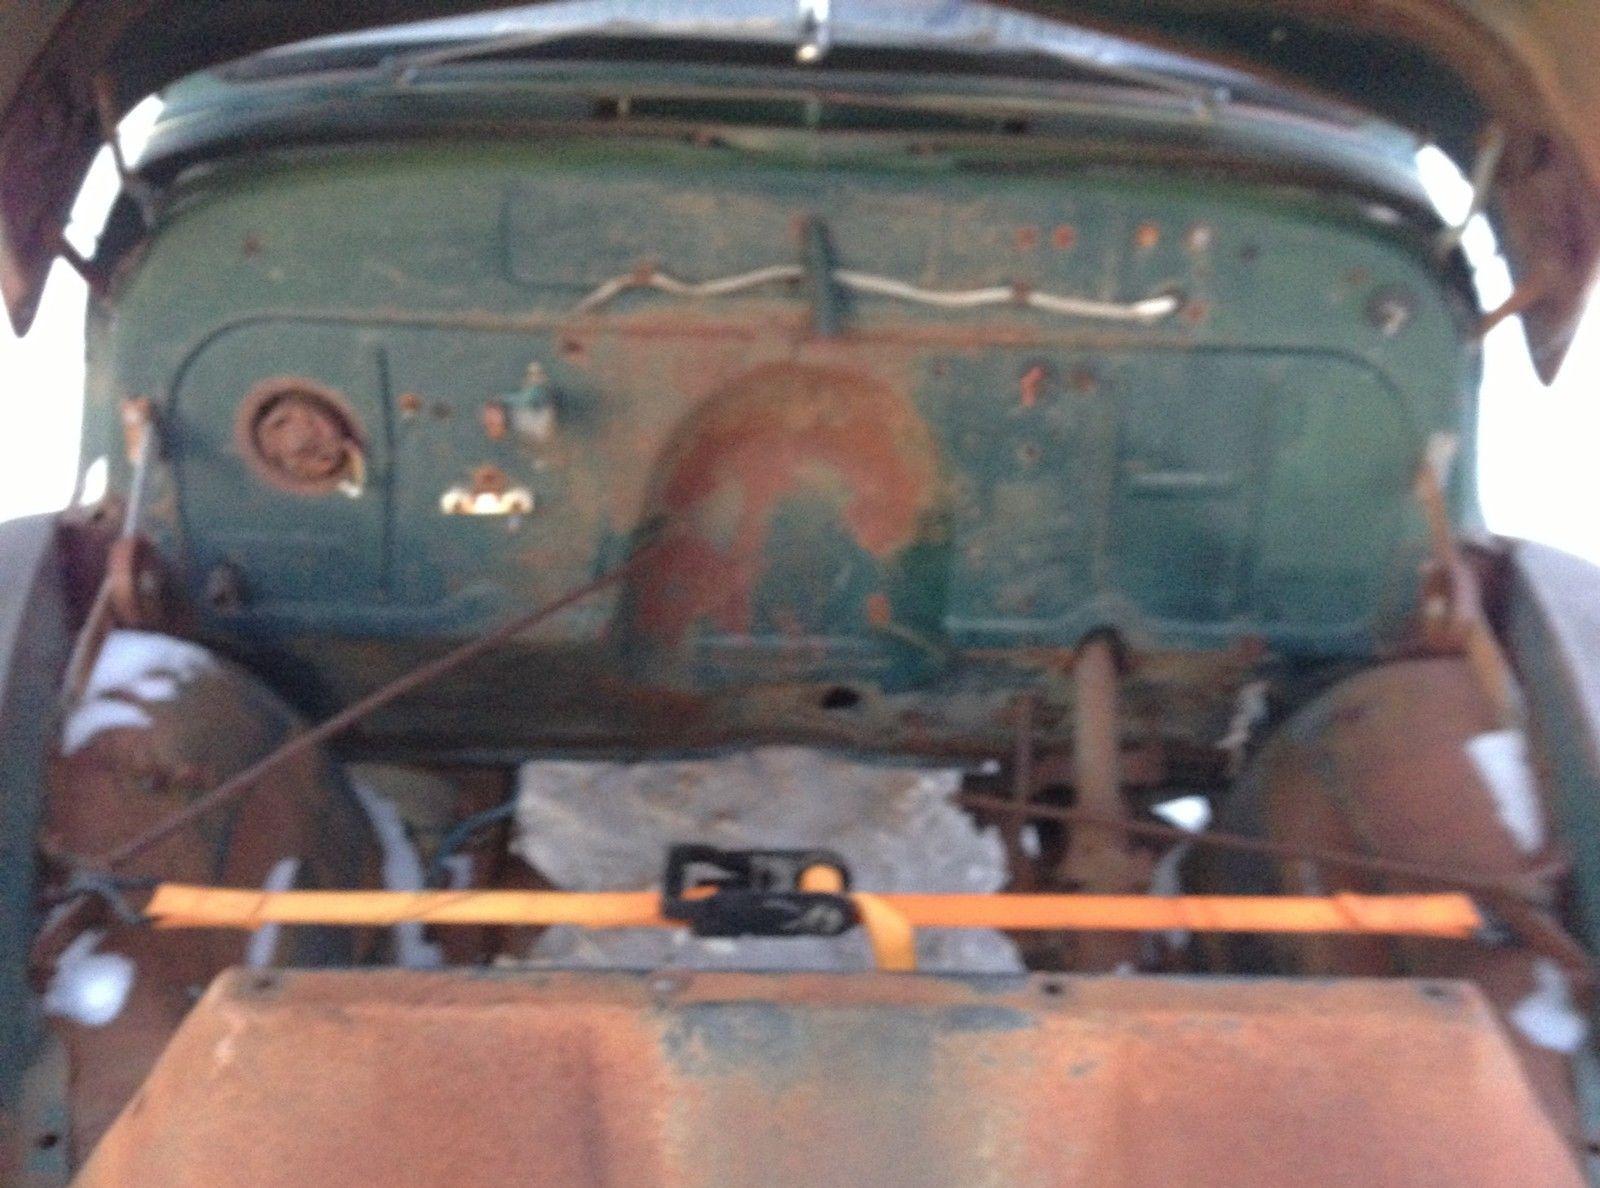 Old Pickups For Sale >> BARN FIND 1950 CHEVROLET 3600 PICKUP TRUCK PATINA HOT RAT ...